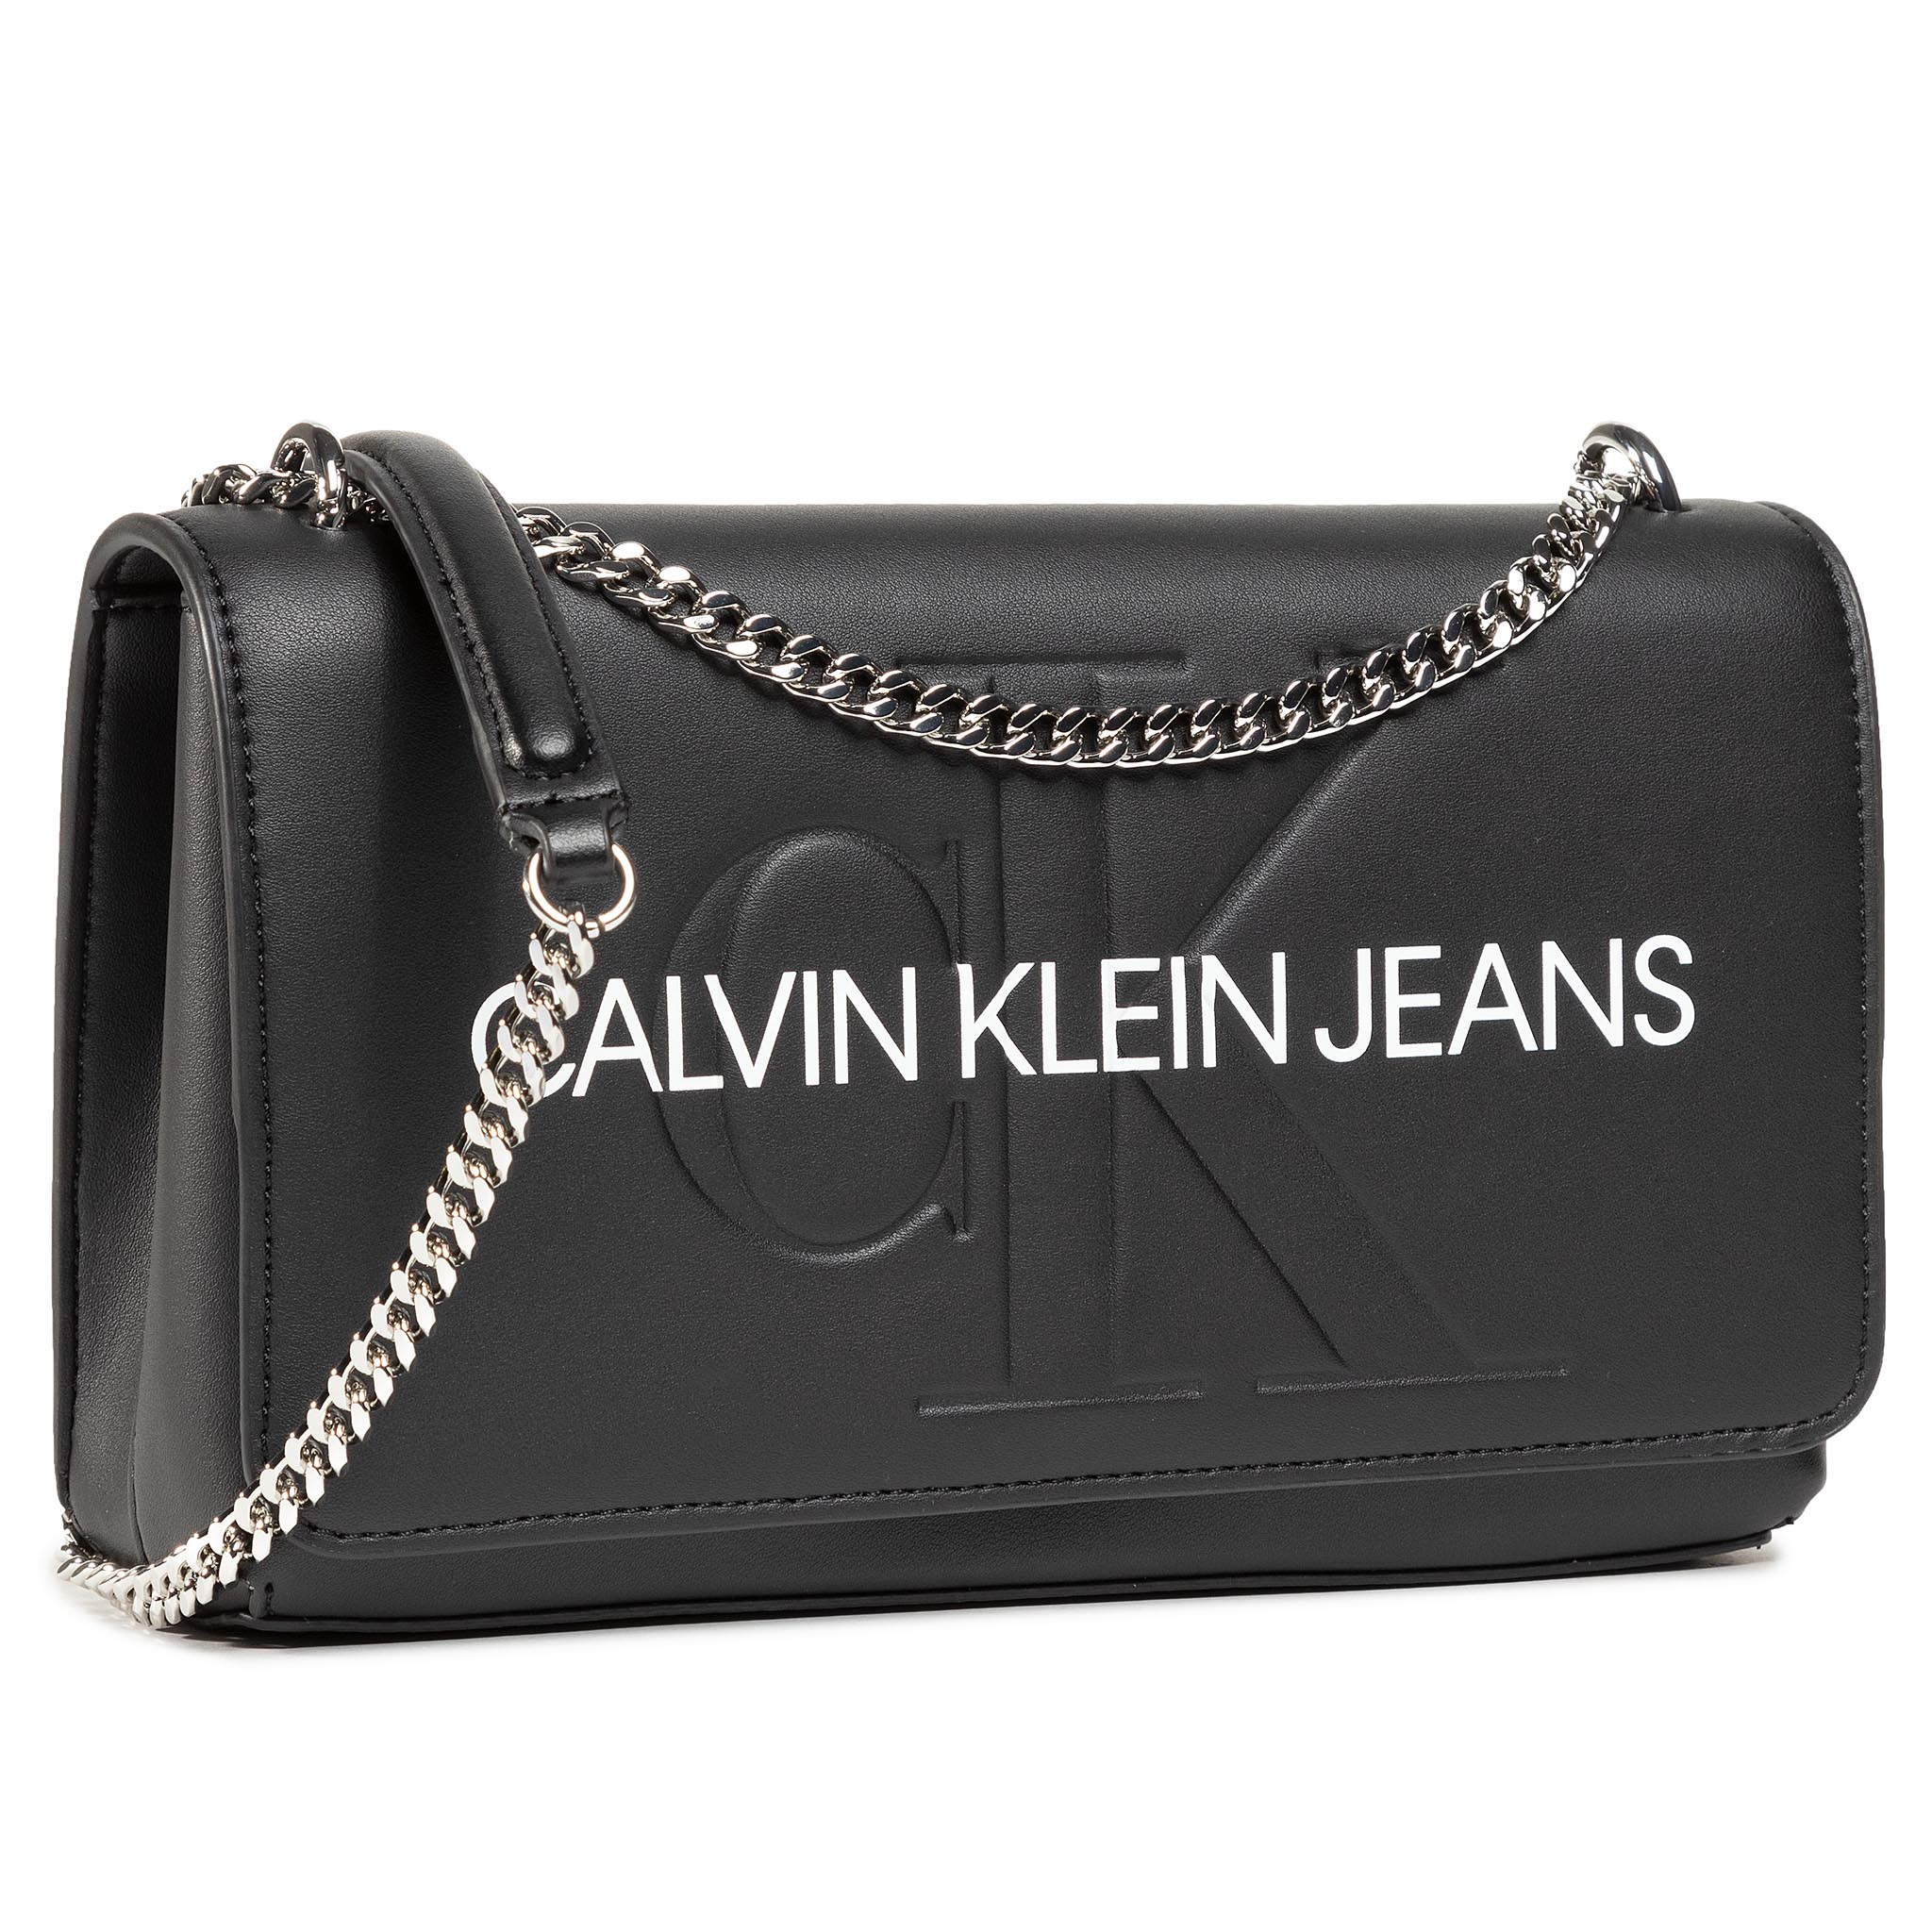 Image of Handtasche CALVIN KLEIN JEANS - Convertible Ew Flap K60K607198 BLK